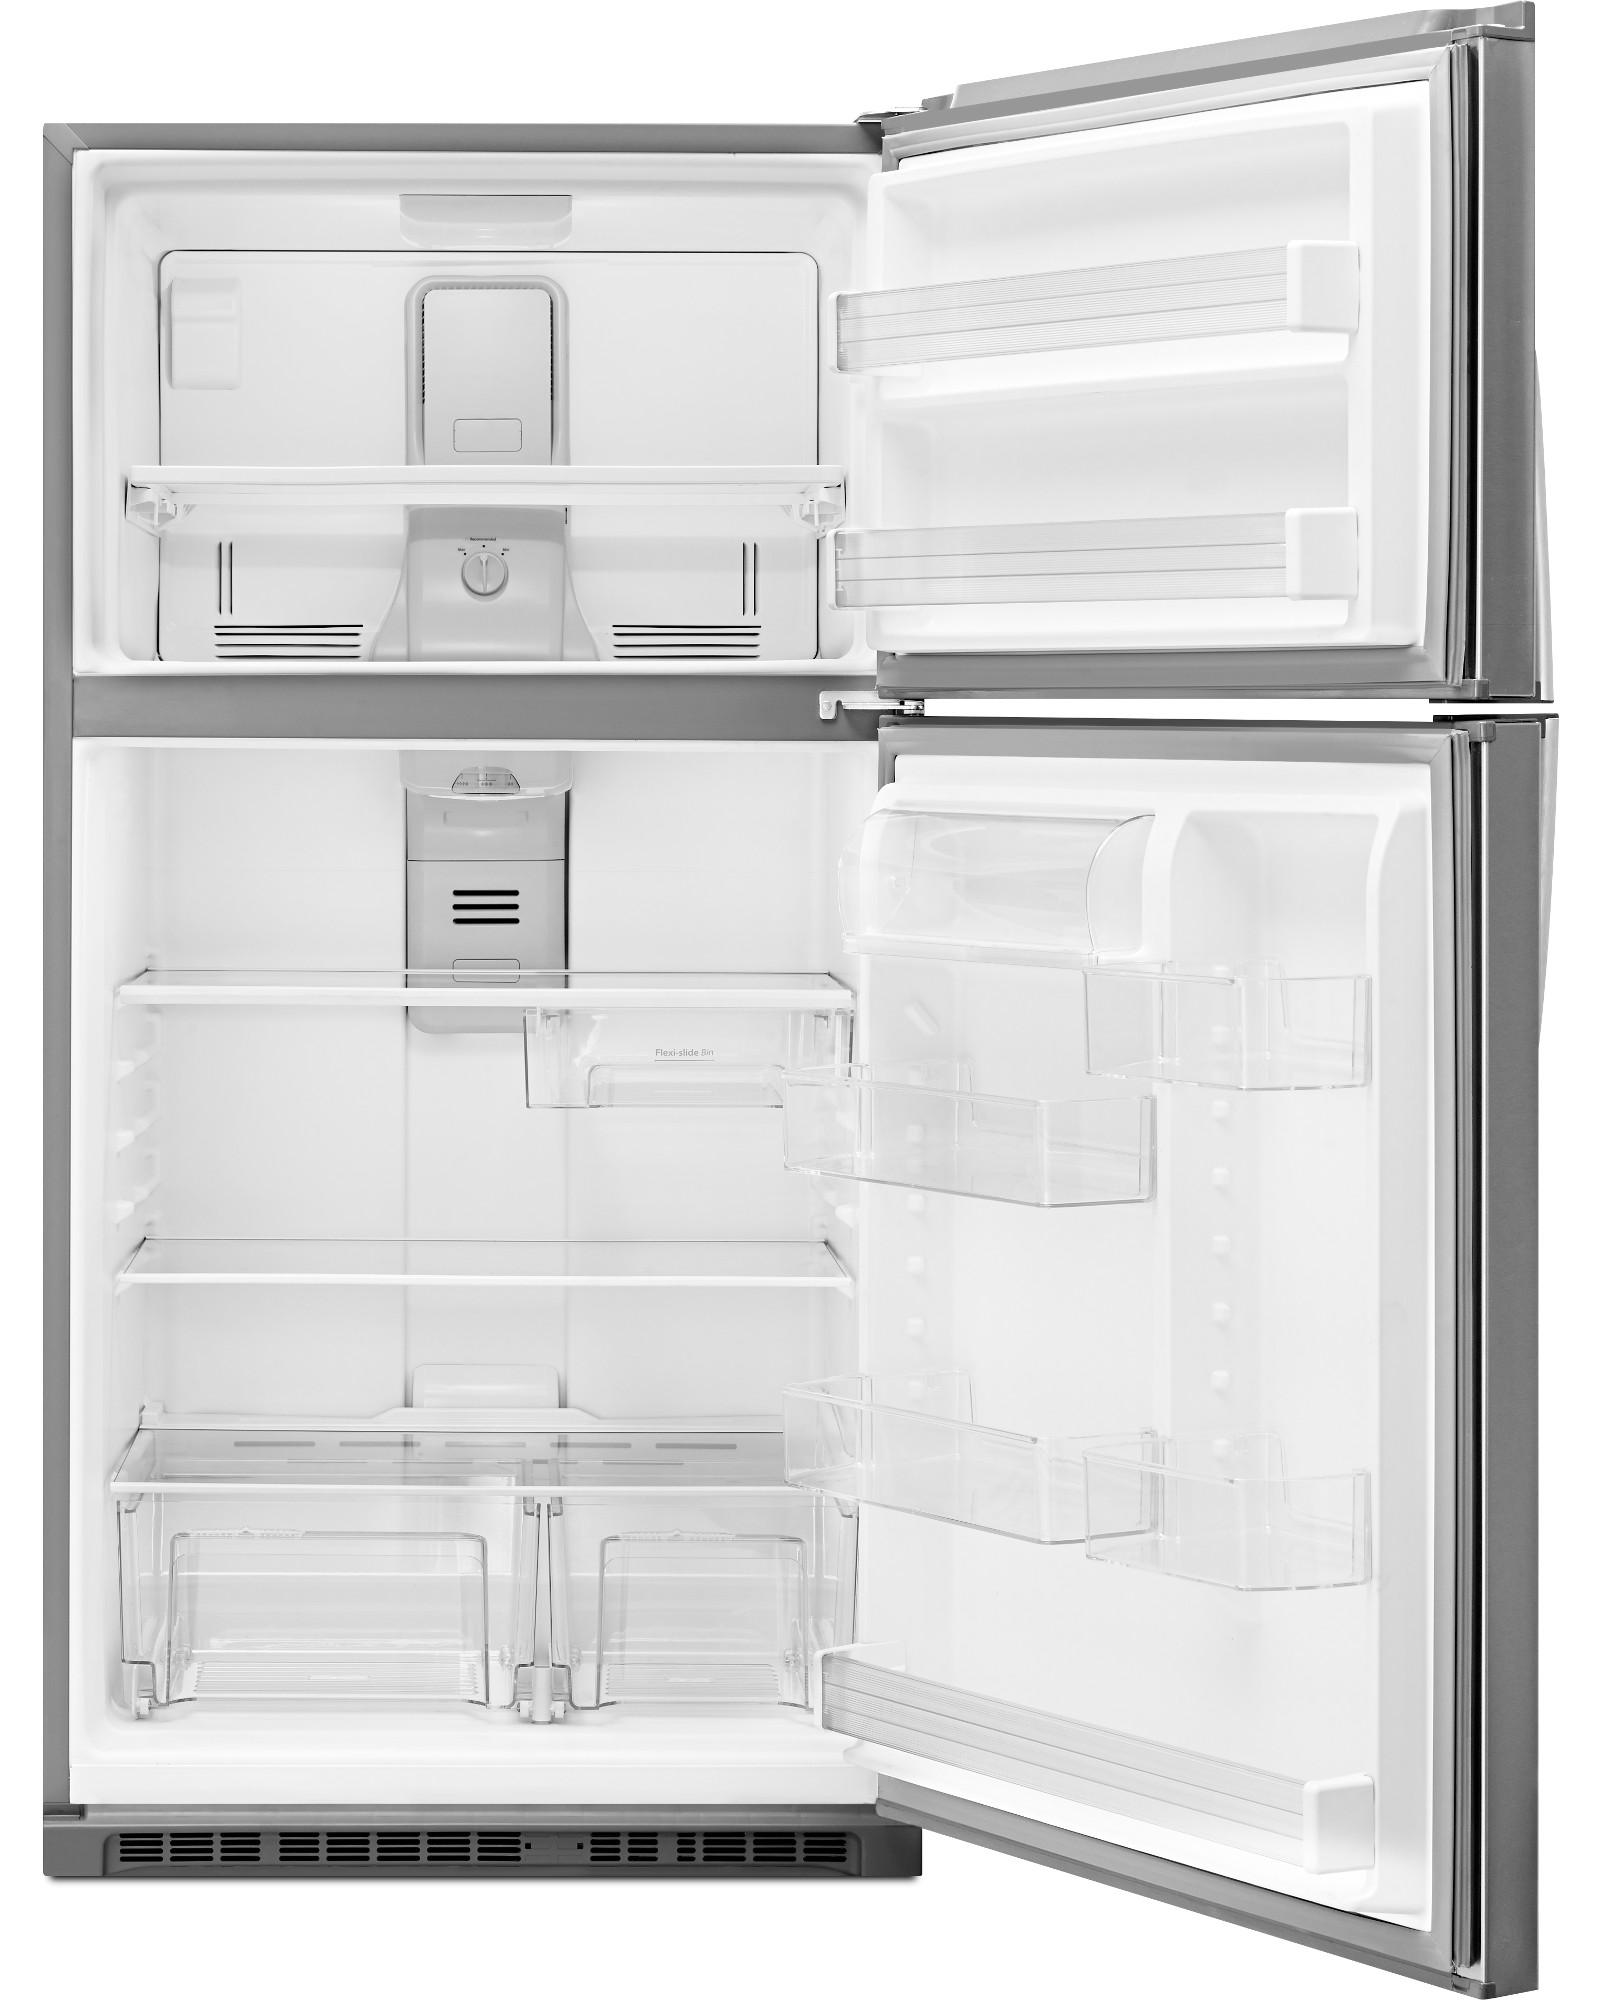 Whirlpool WRT541SZDM 21 cu. ft. Top Freezer Refrigerator - Stainless Steel